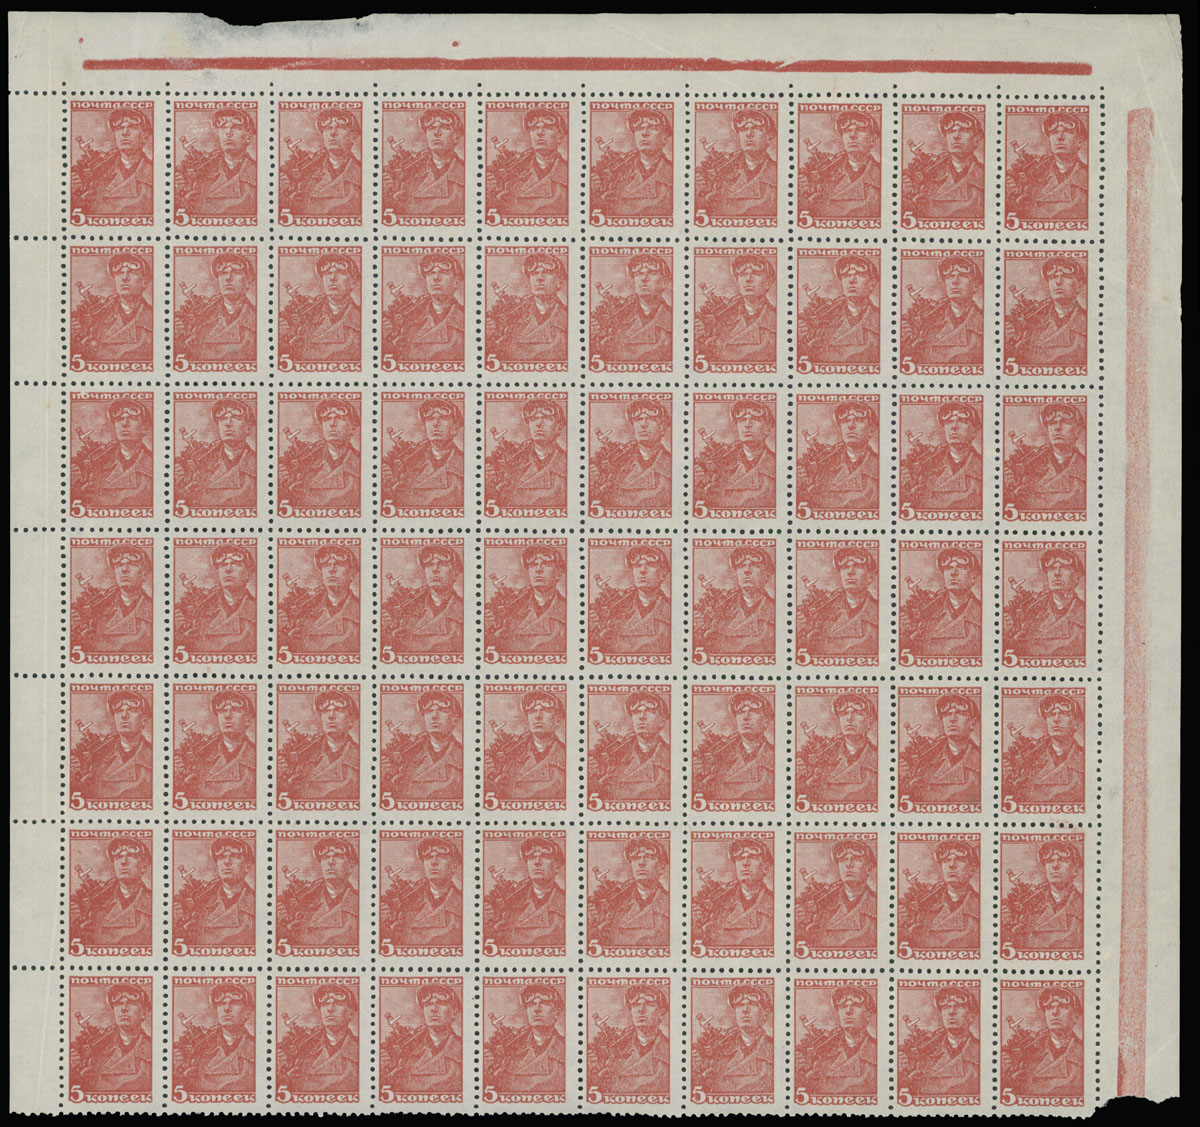 Lot 1066 - russia - soviet union - collections  -  Raritan Stamps Inc. Live Bidding Auction #90